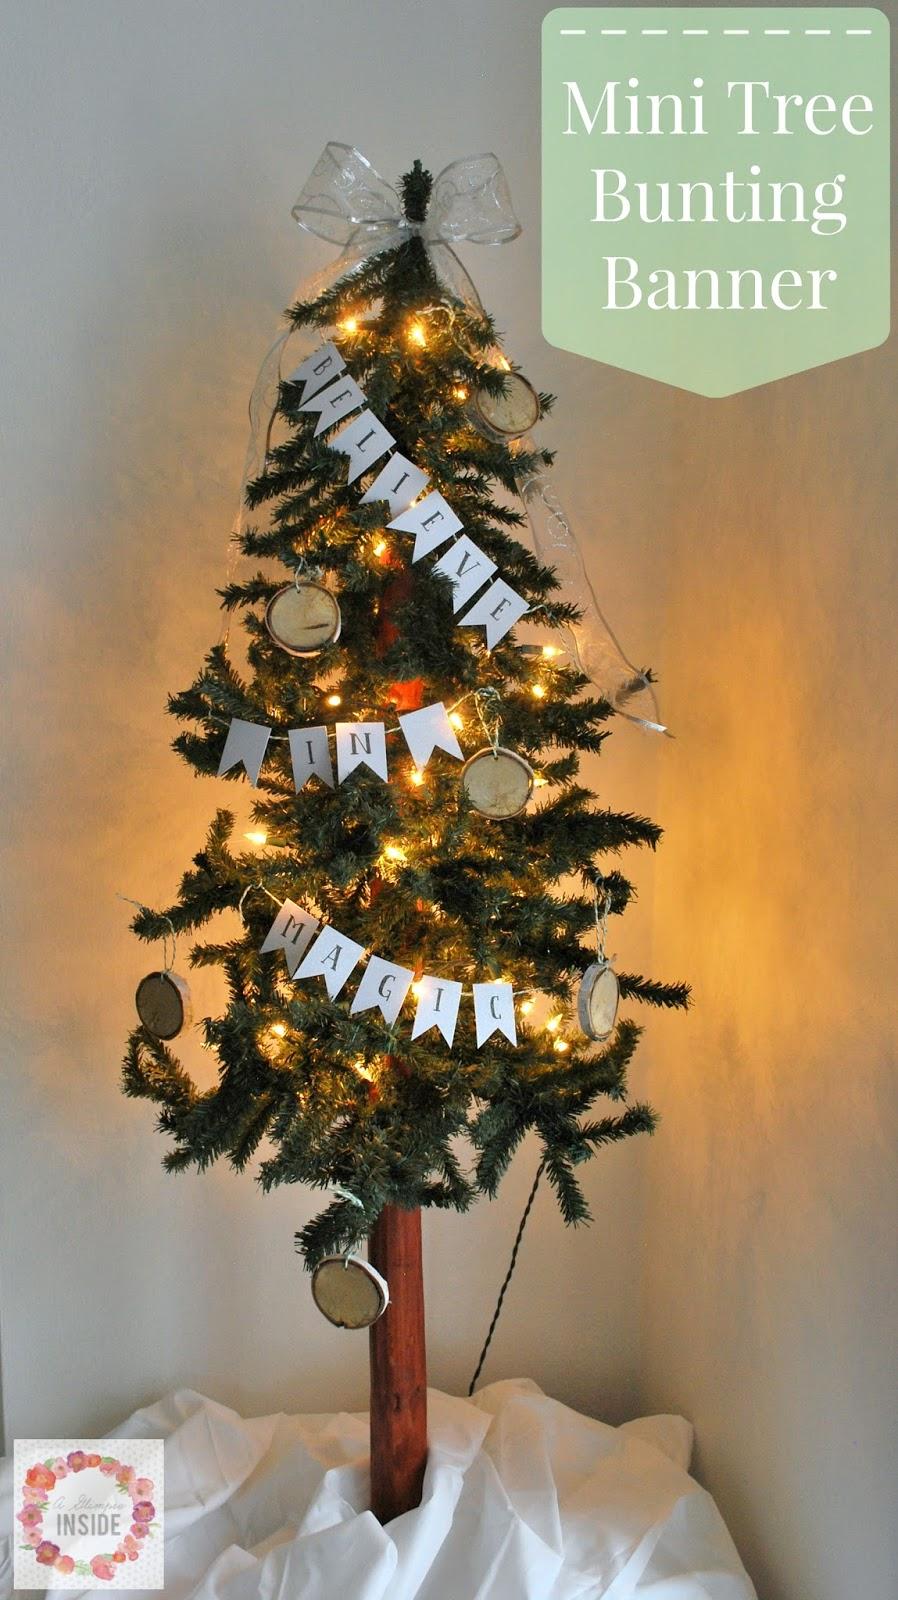 http://www.aglimpseinsideblog.com/2015/11/easy-mini-tree-bunting-banner.html